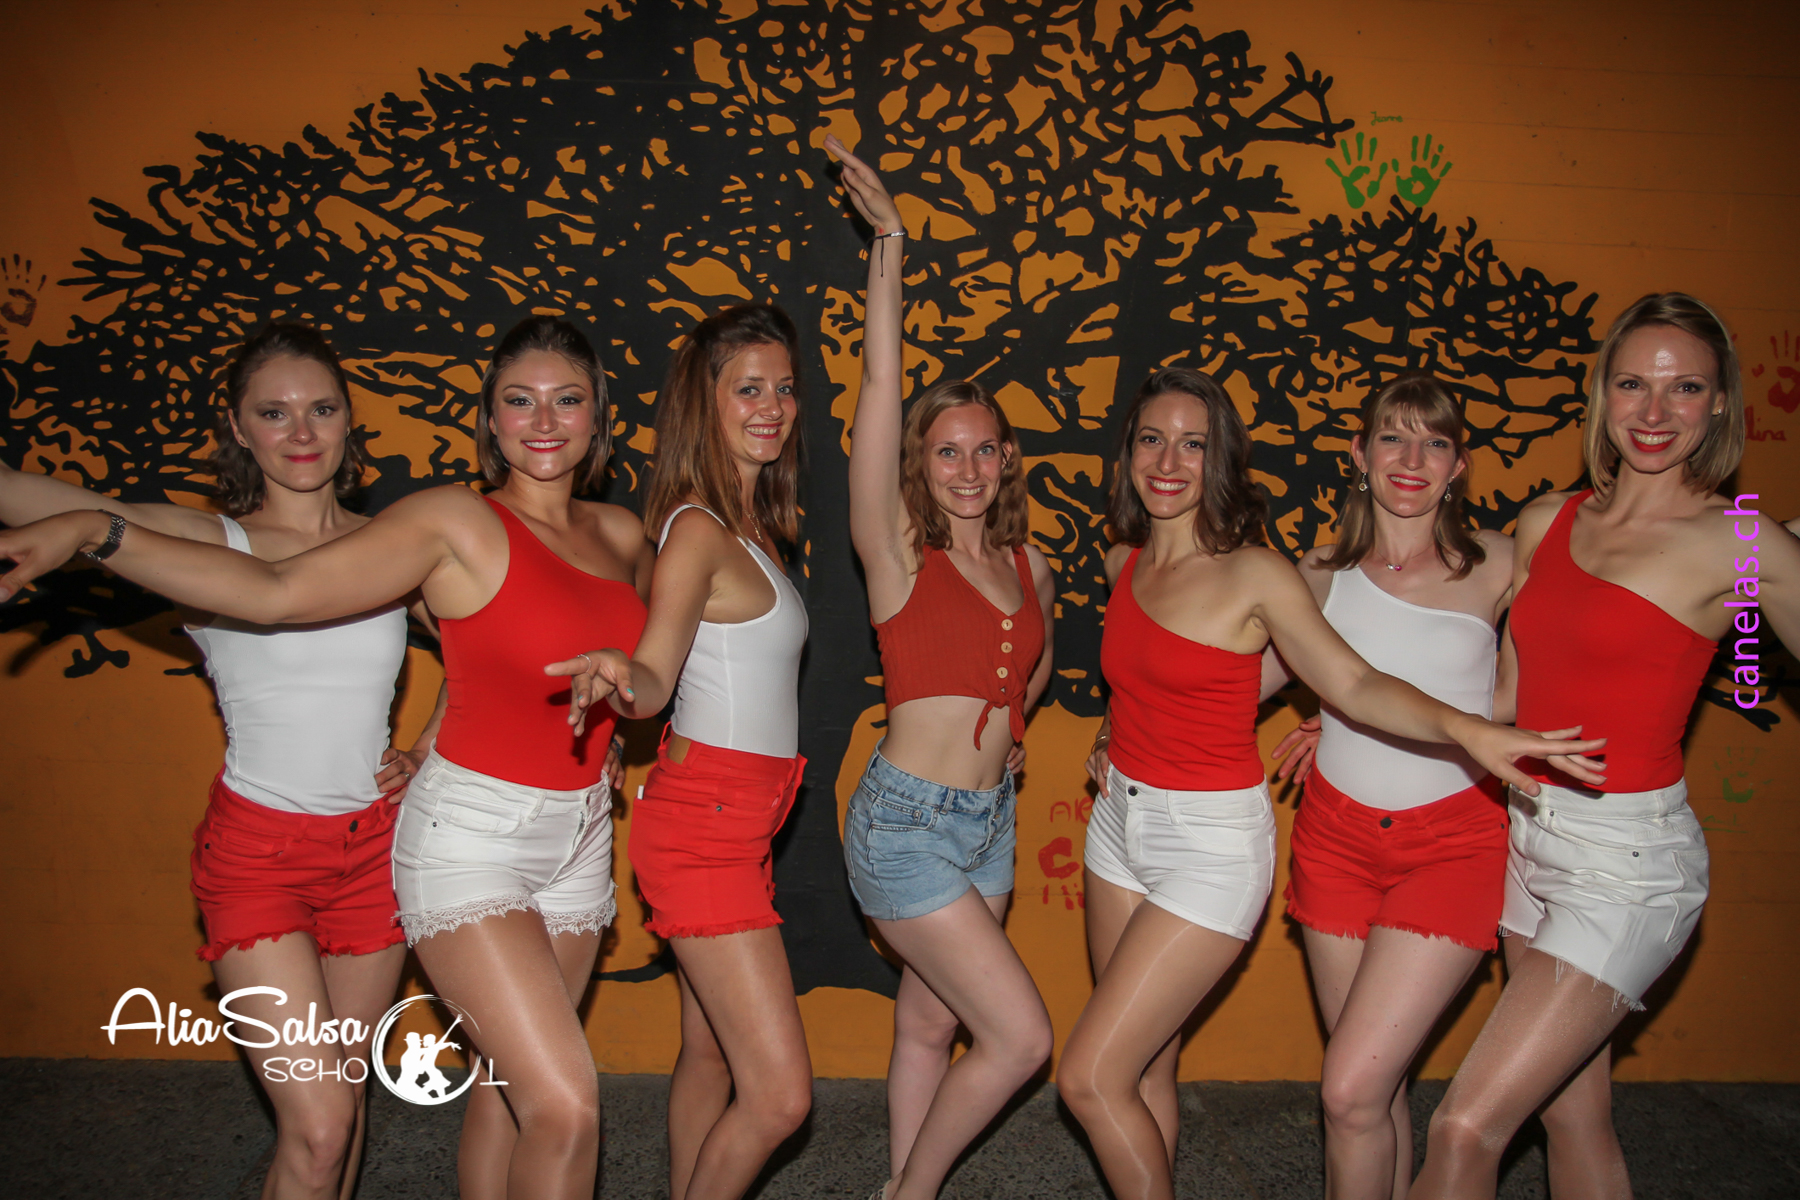 AliaSalsa ecole de danse lausanne soiree bachata salsa cubaineAlia Salsa Soireé Salsa - Bachata-32